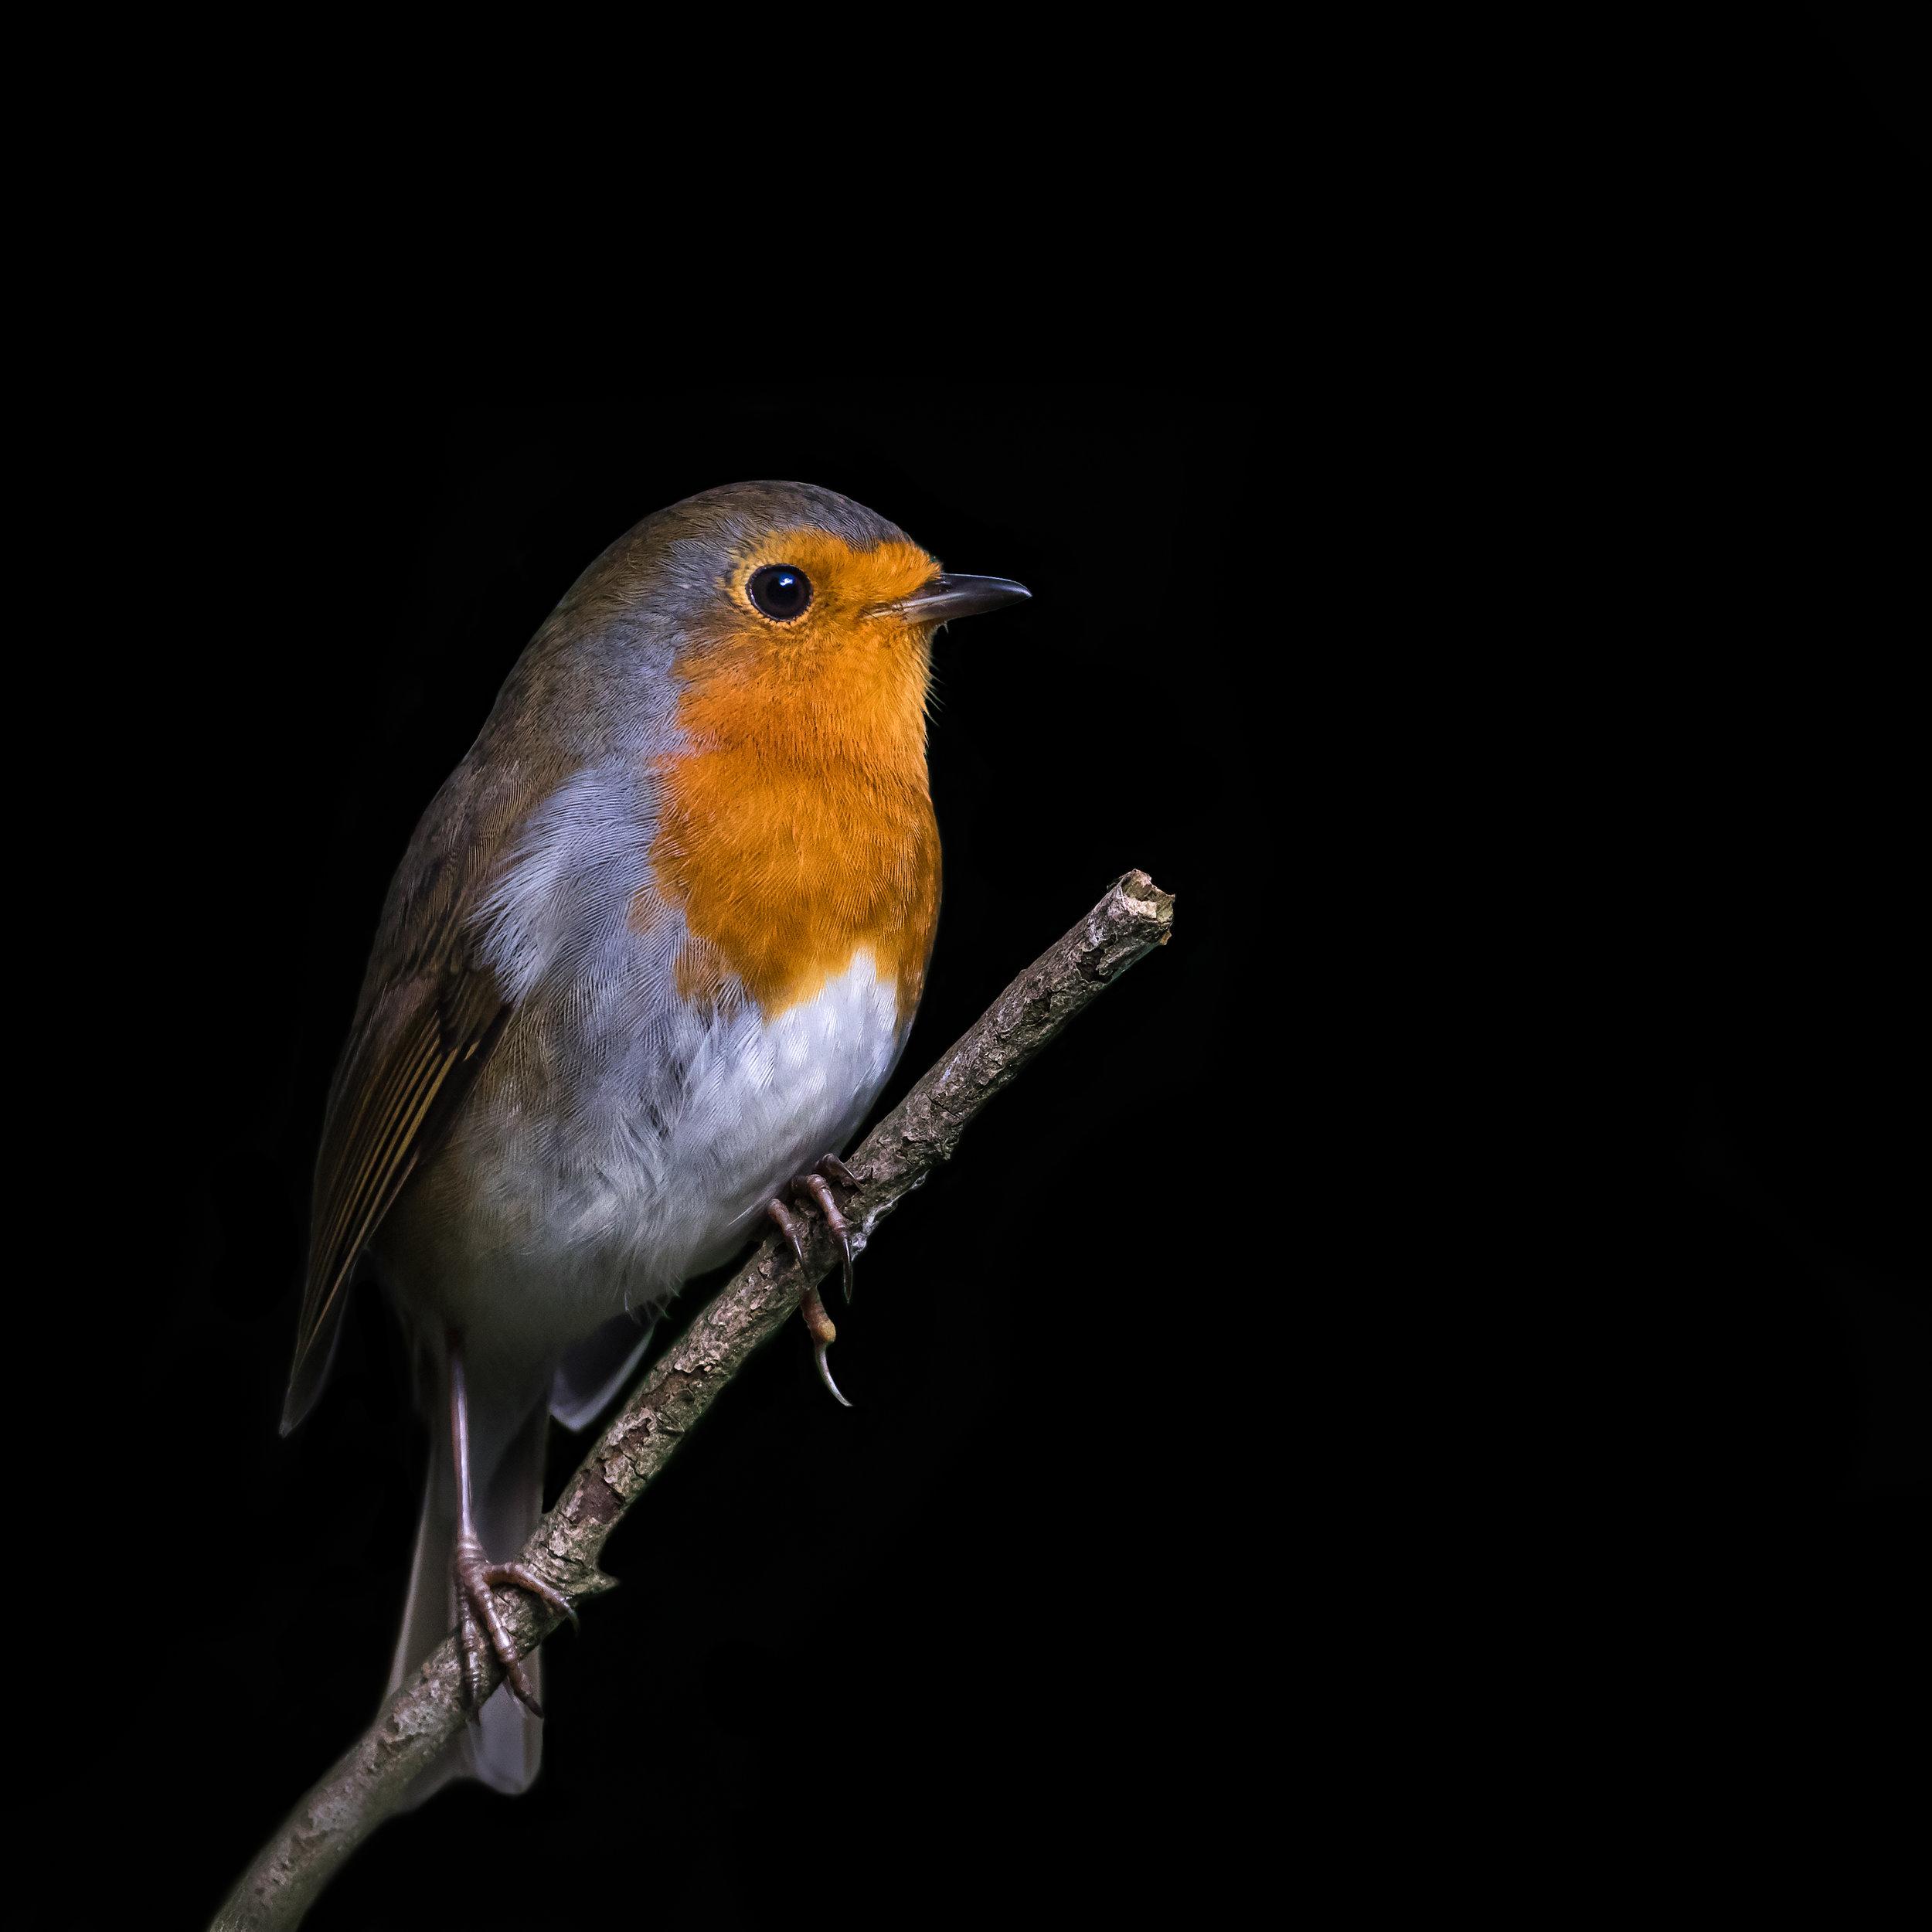 Robin portrait #1